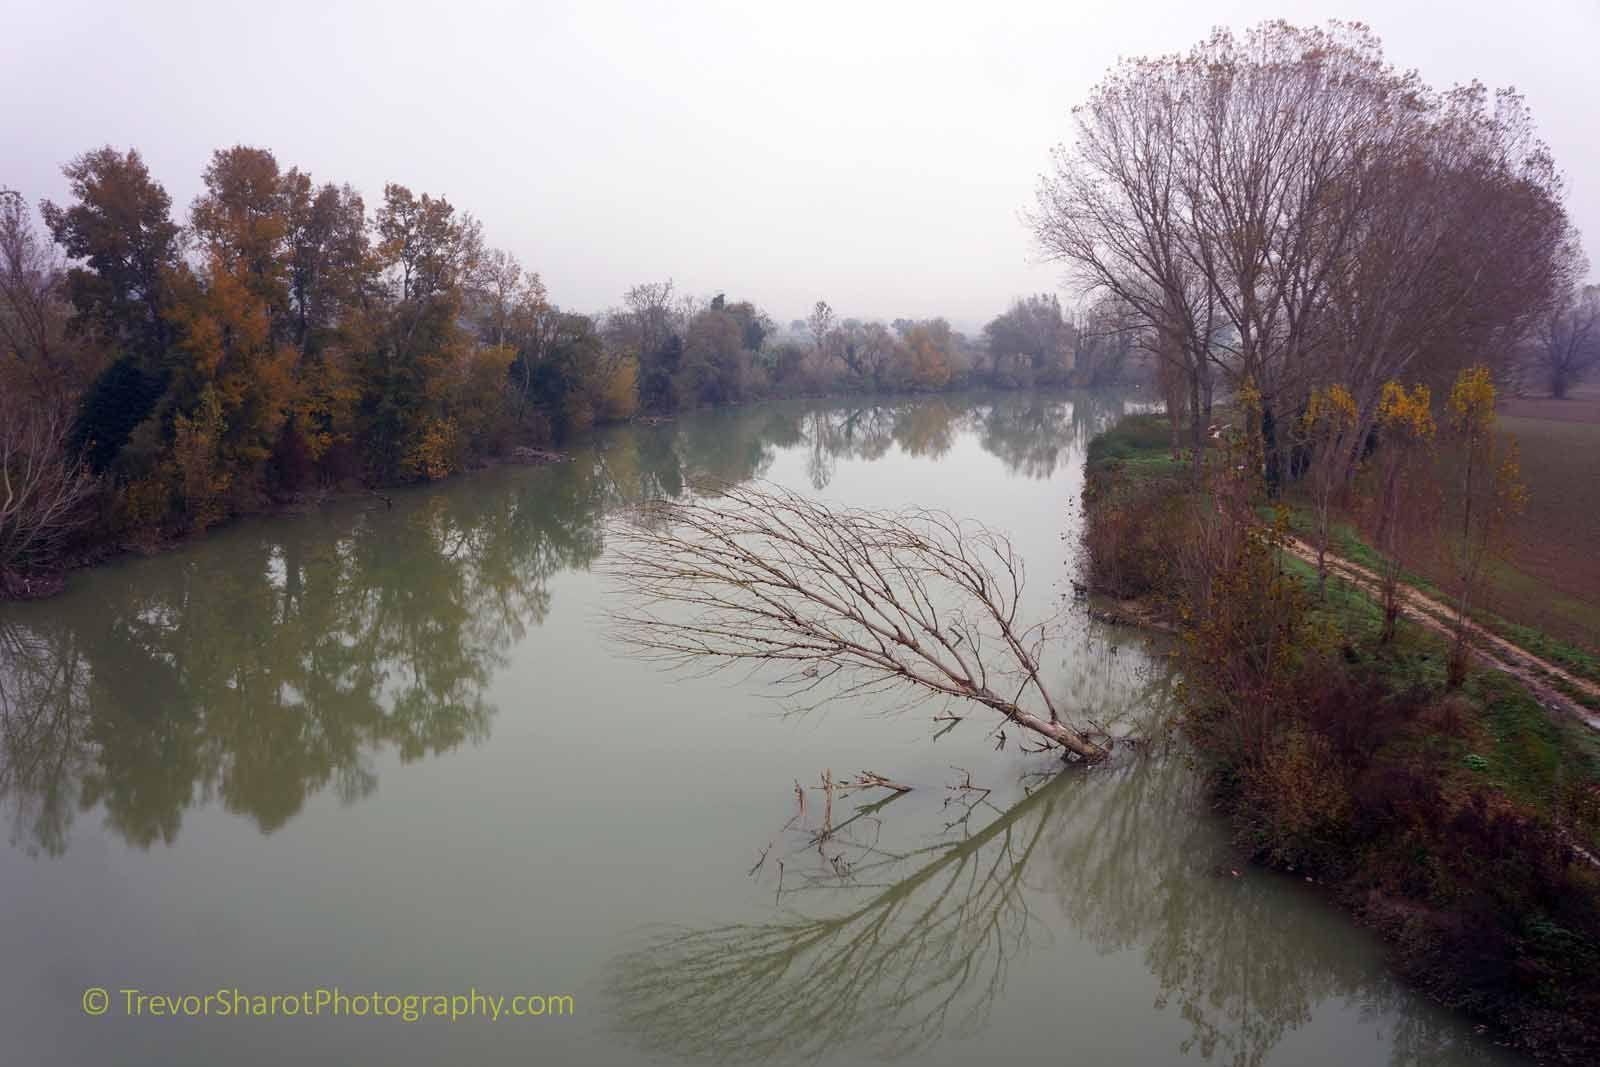 River Tiber near Montemolino